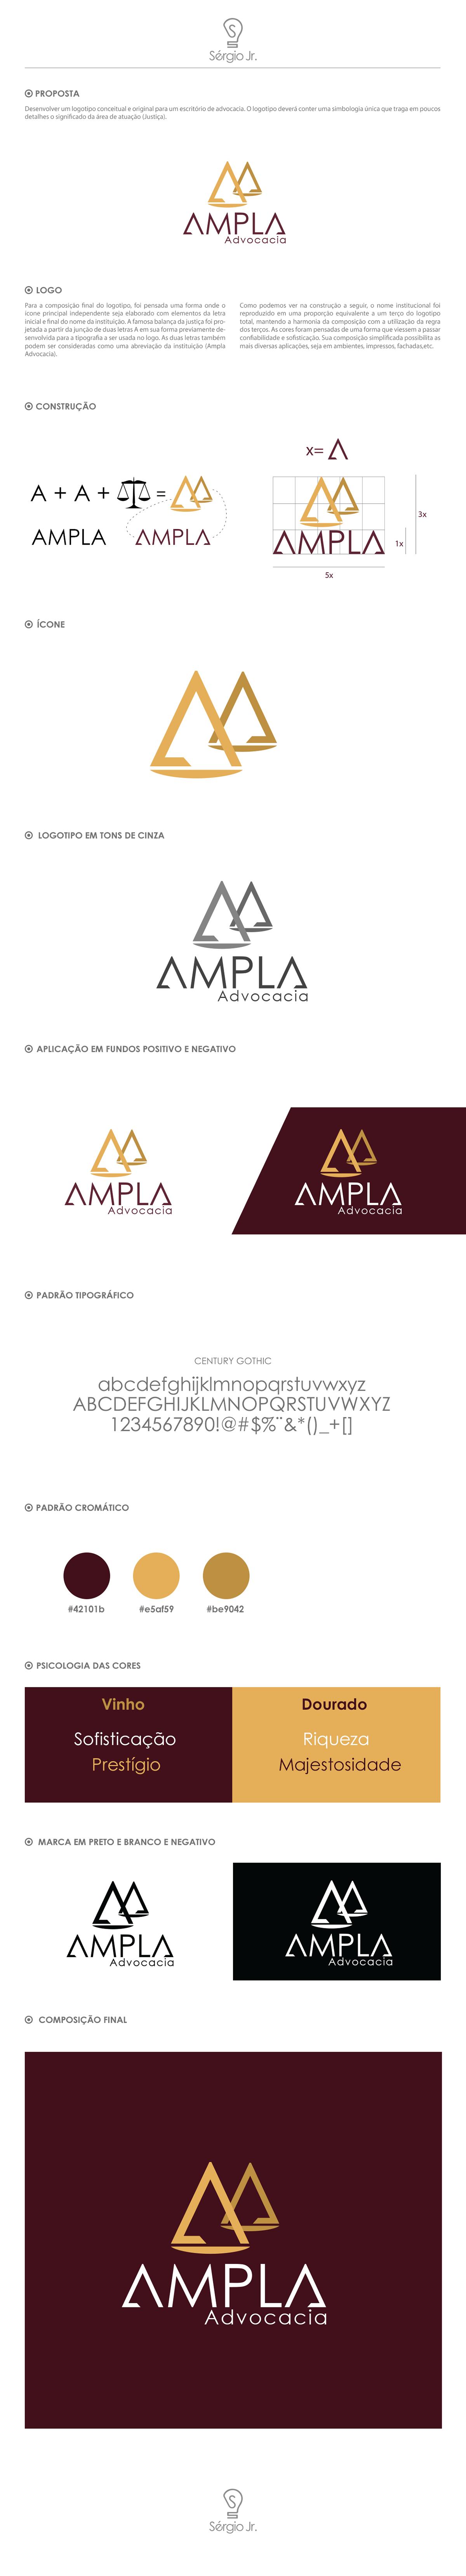 Logotipo Ampla Advocacia on Behance